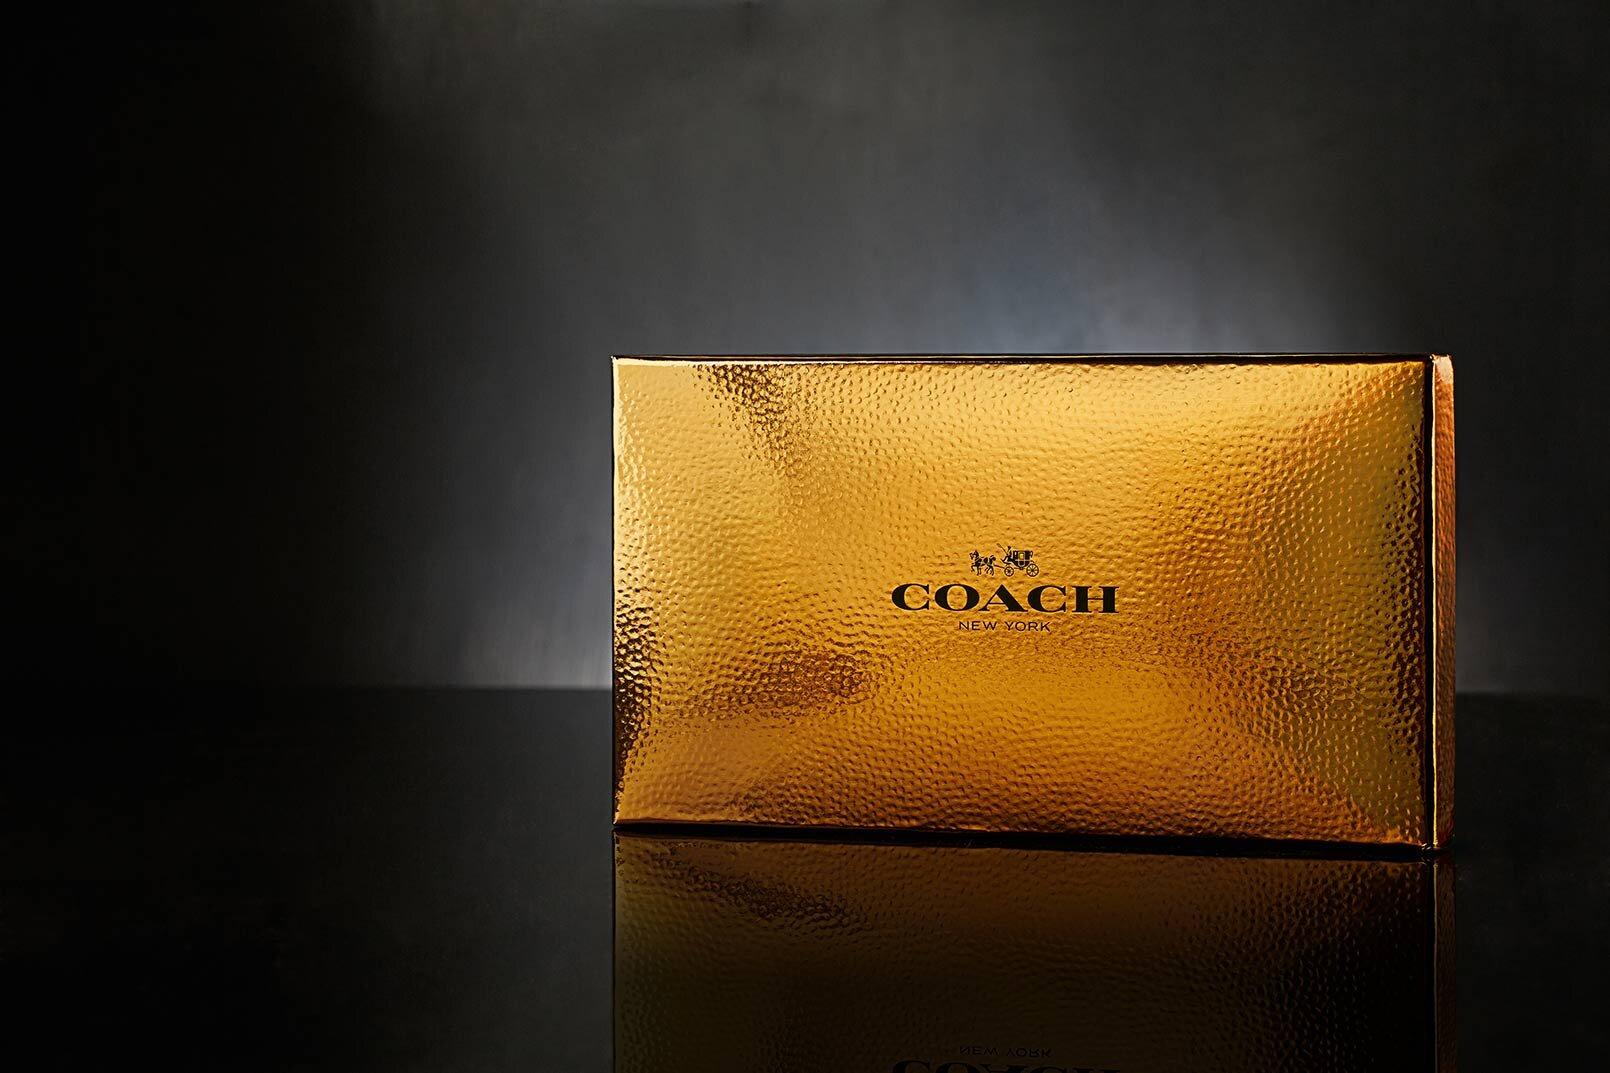 Coach-Box-Holiday-Design-Packaging-Company-1.jpg